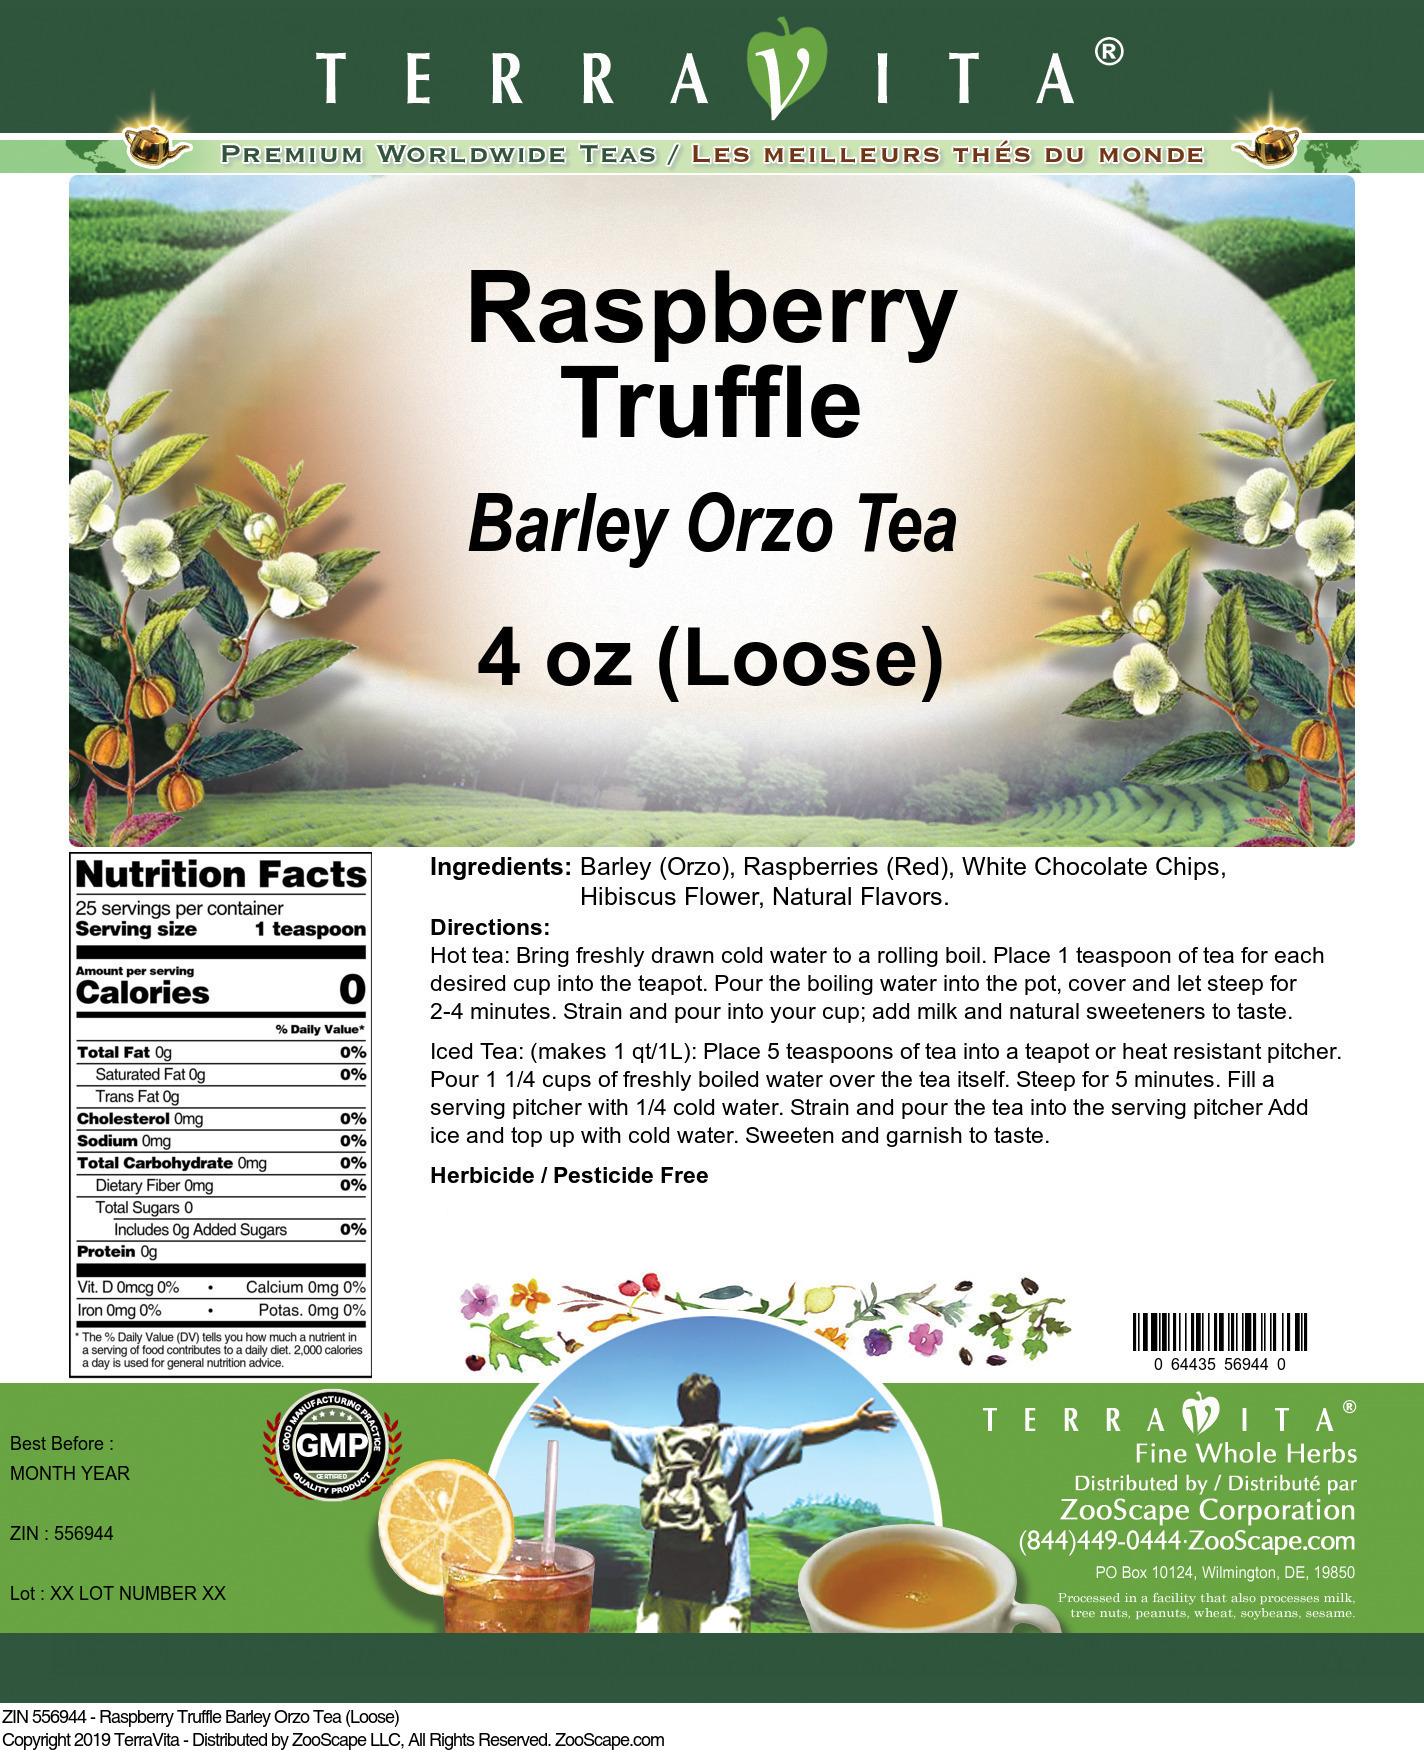 Raspberry Truffle Barley Orzo Tea (Loose)